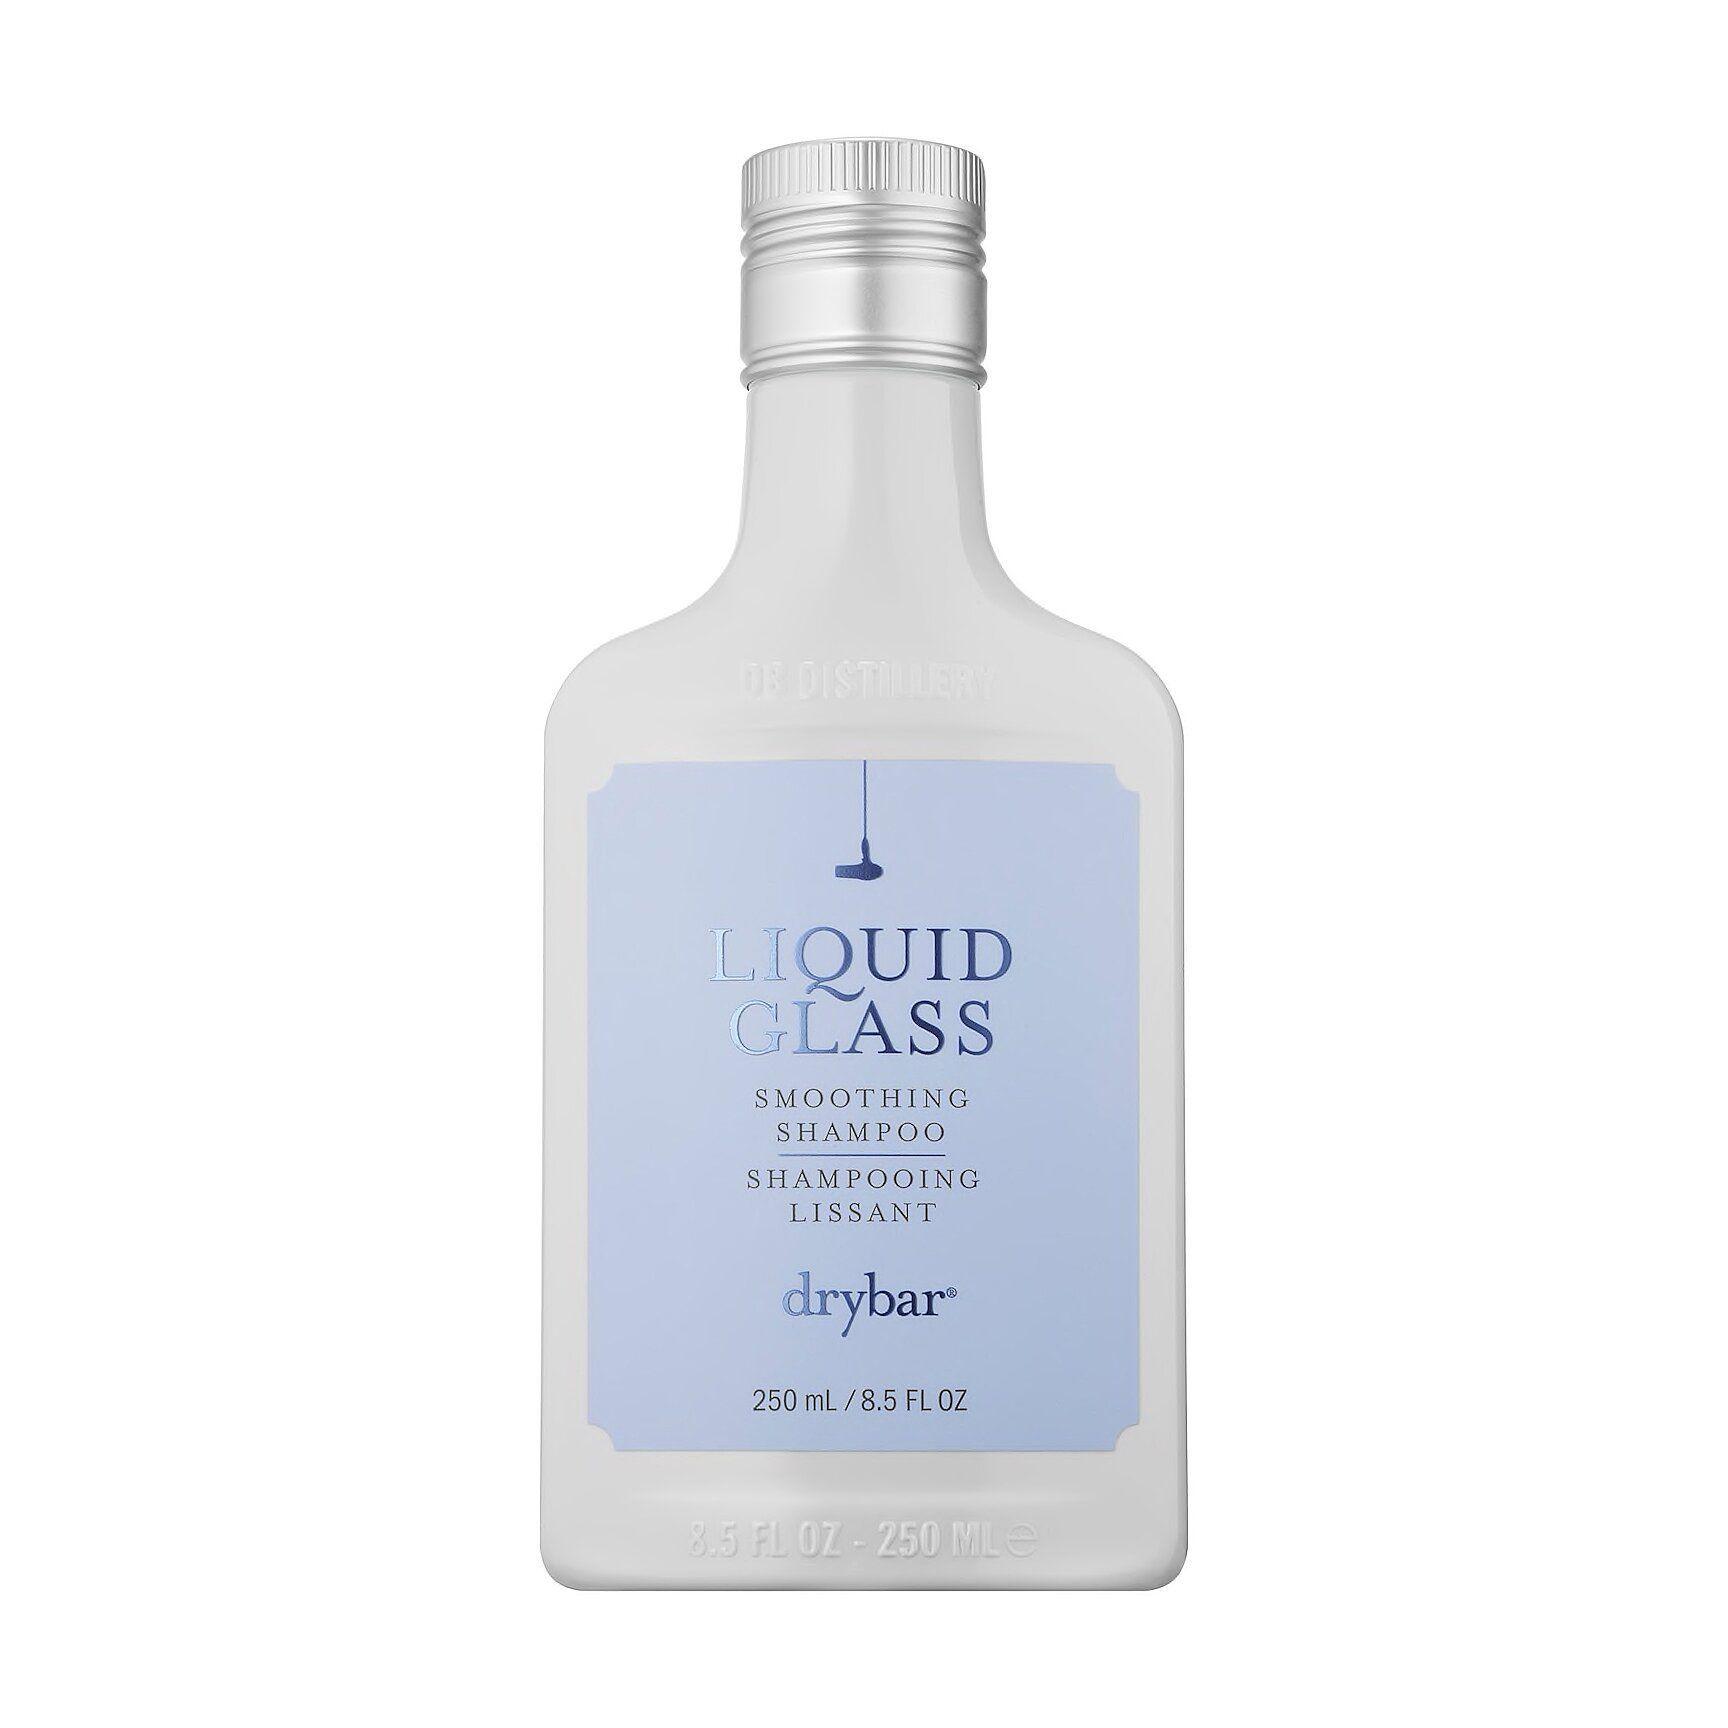 Drybar Liquid Glass Smoothing Shampoo Antifrizz Best Volumizing Hair Products Drugstore Beauty Smoothing Shampoos Drugstore Hair Products Anti Frizz Shampoo